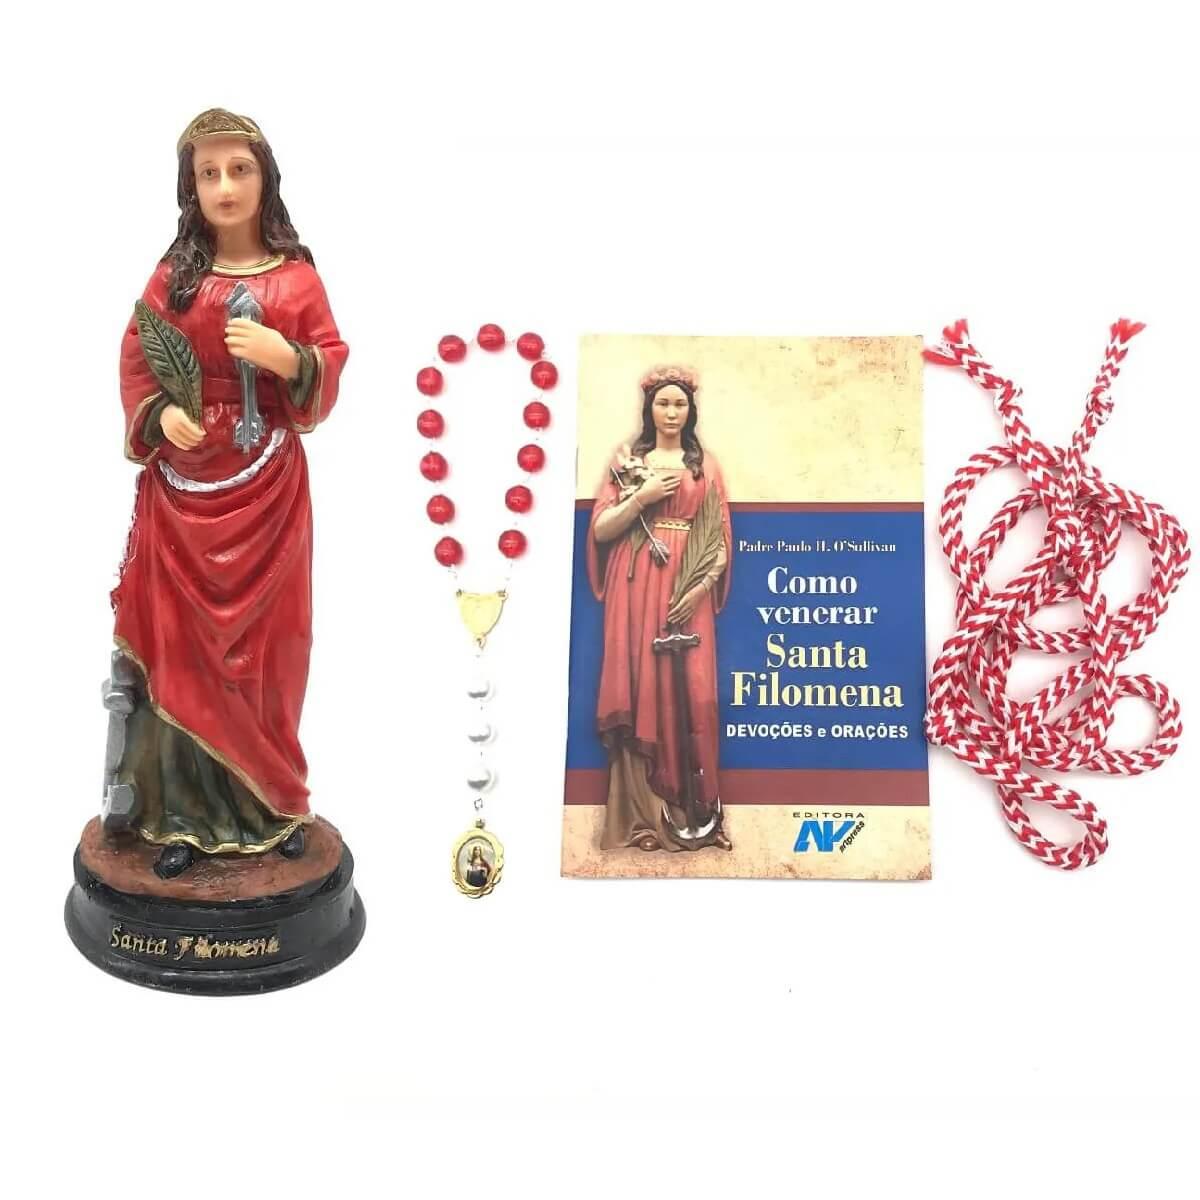 Kit Imagem E Livro Como Venerar Santa Filomena